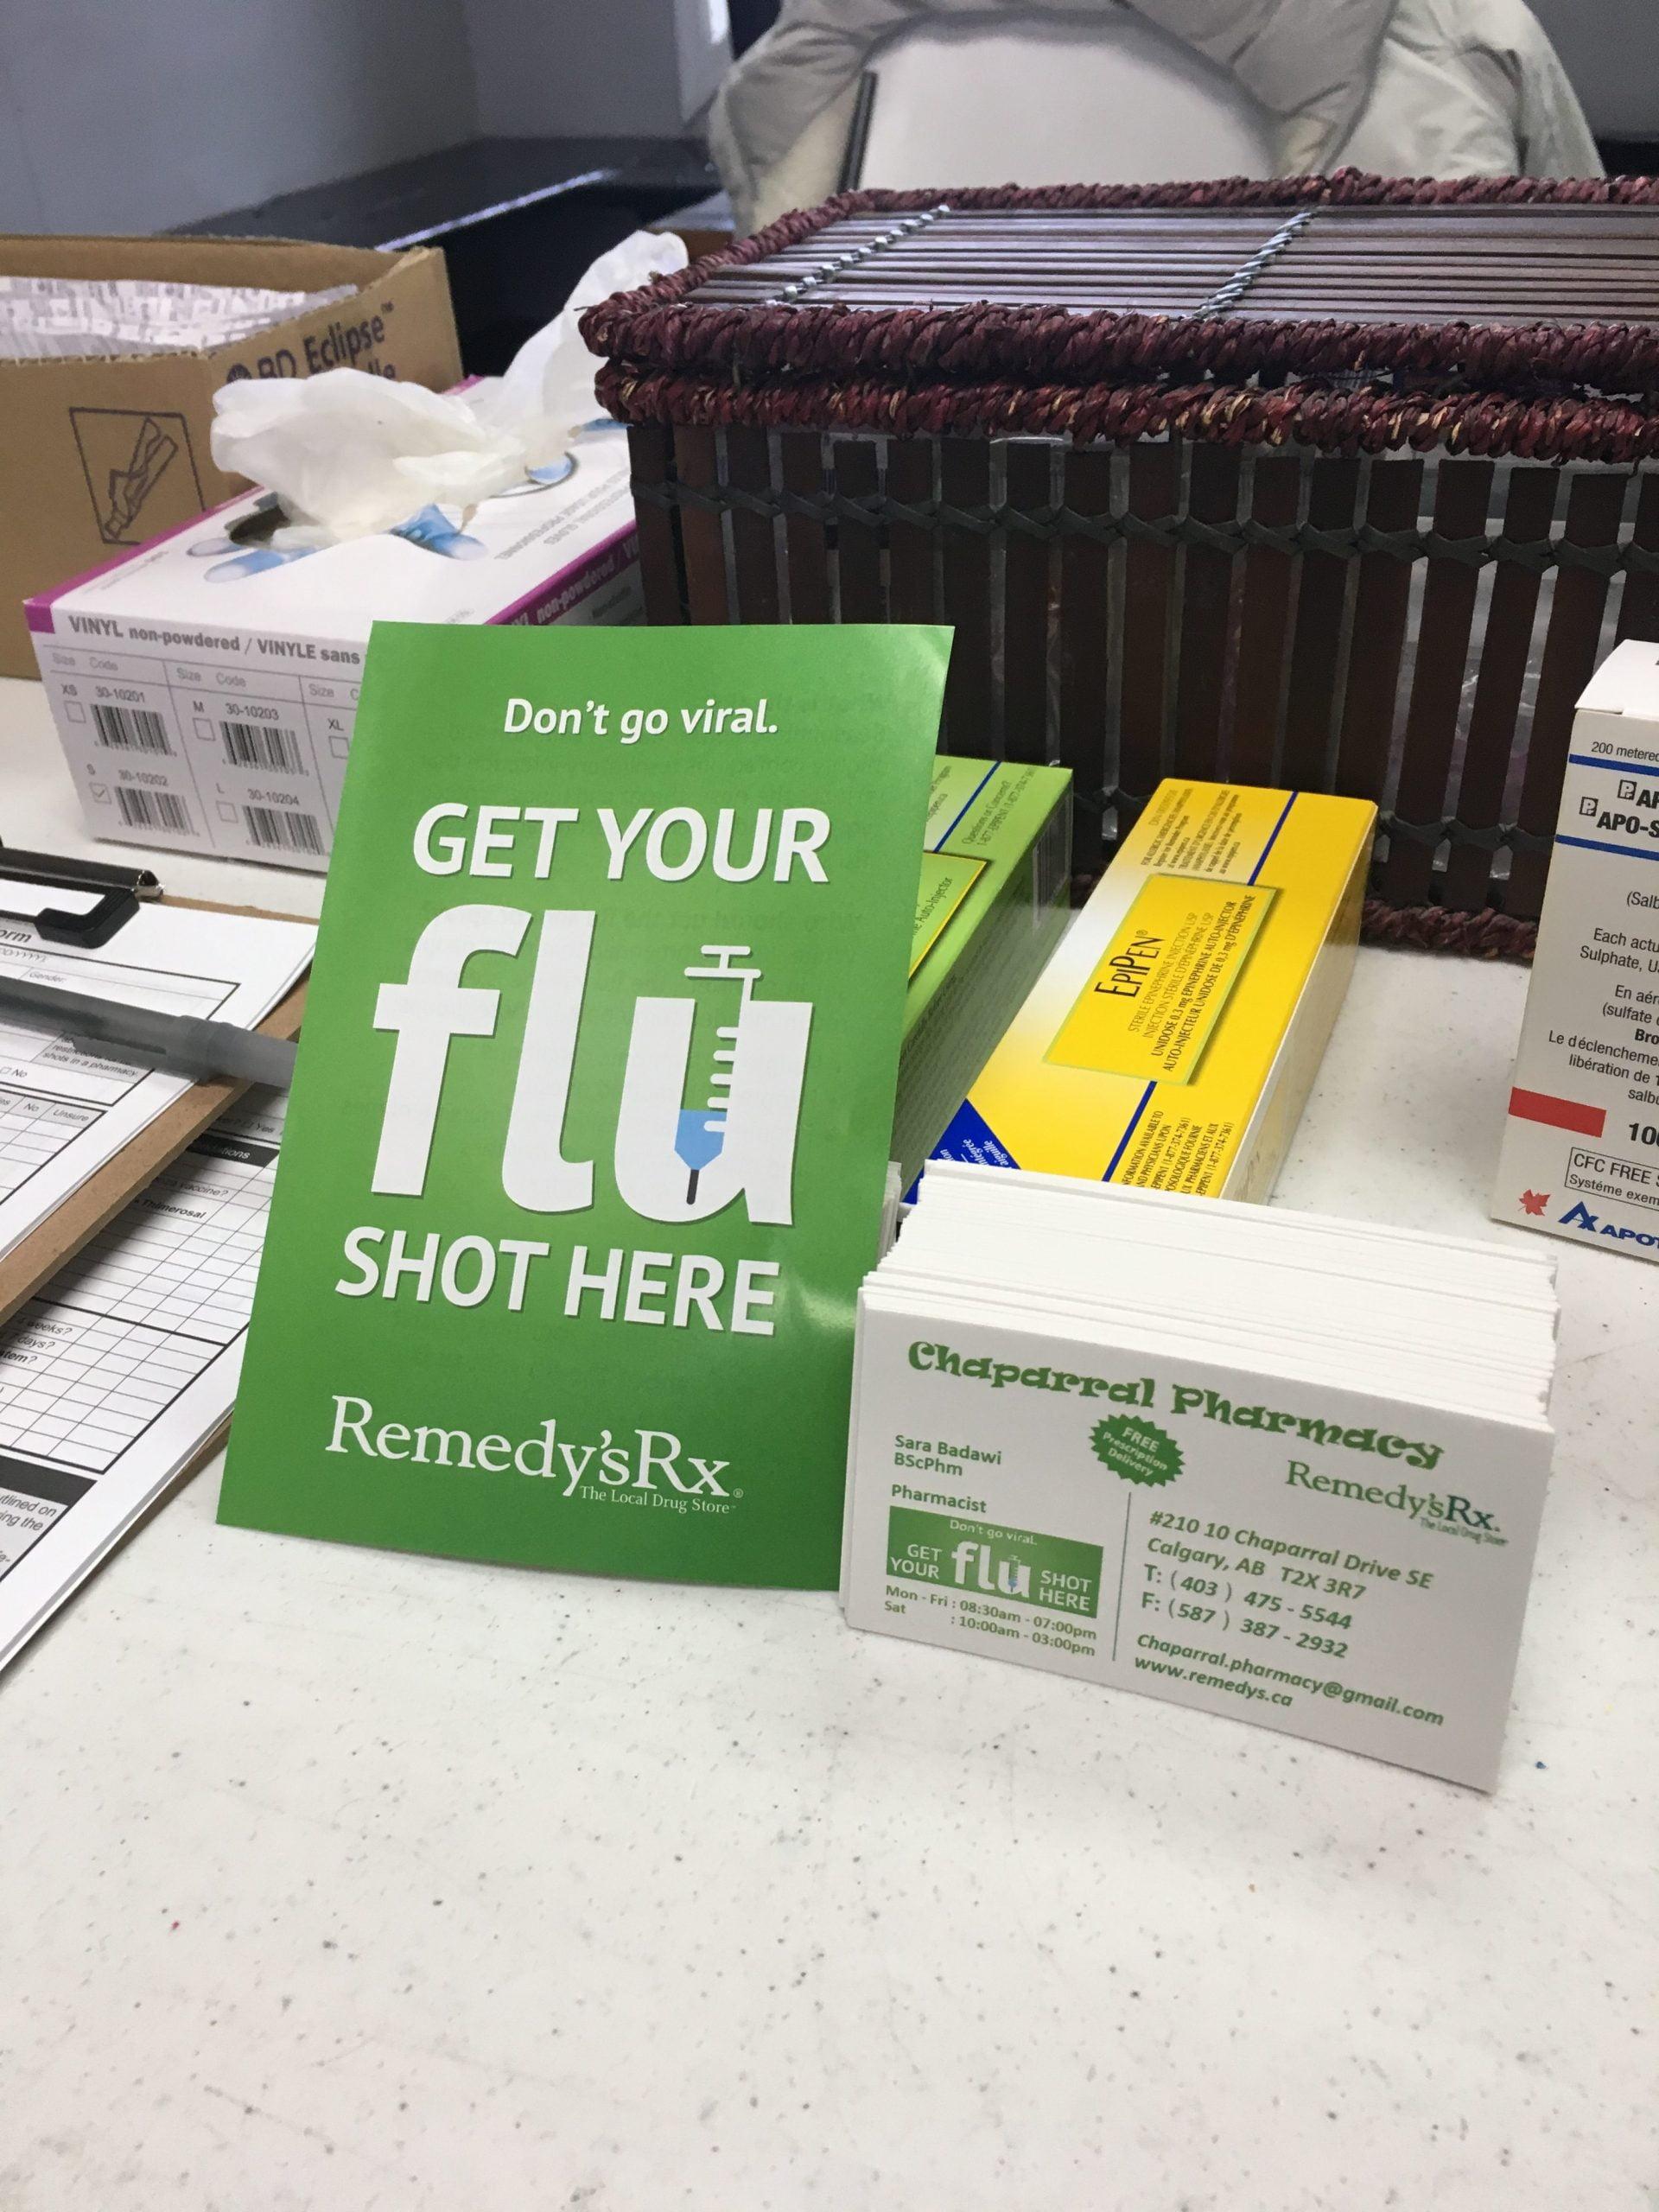 Chaparral Pharmacy Flu Clinic at Lake Chaparral, Calgary AB